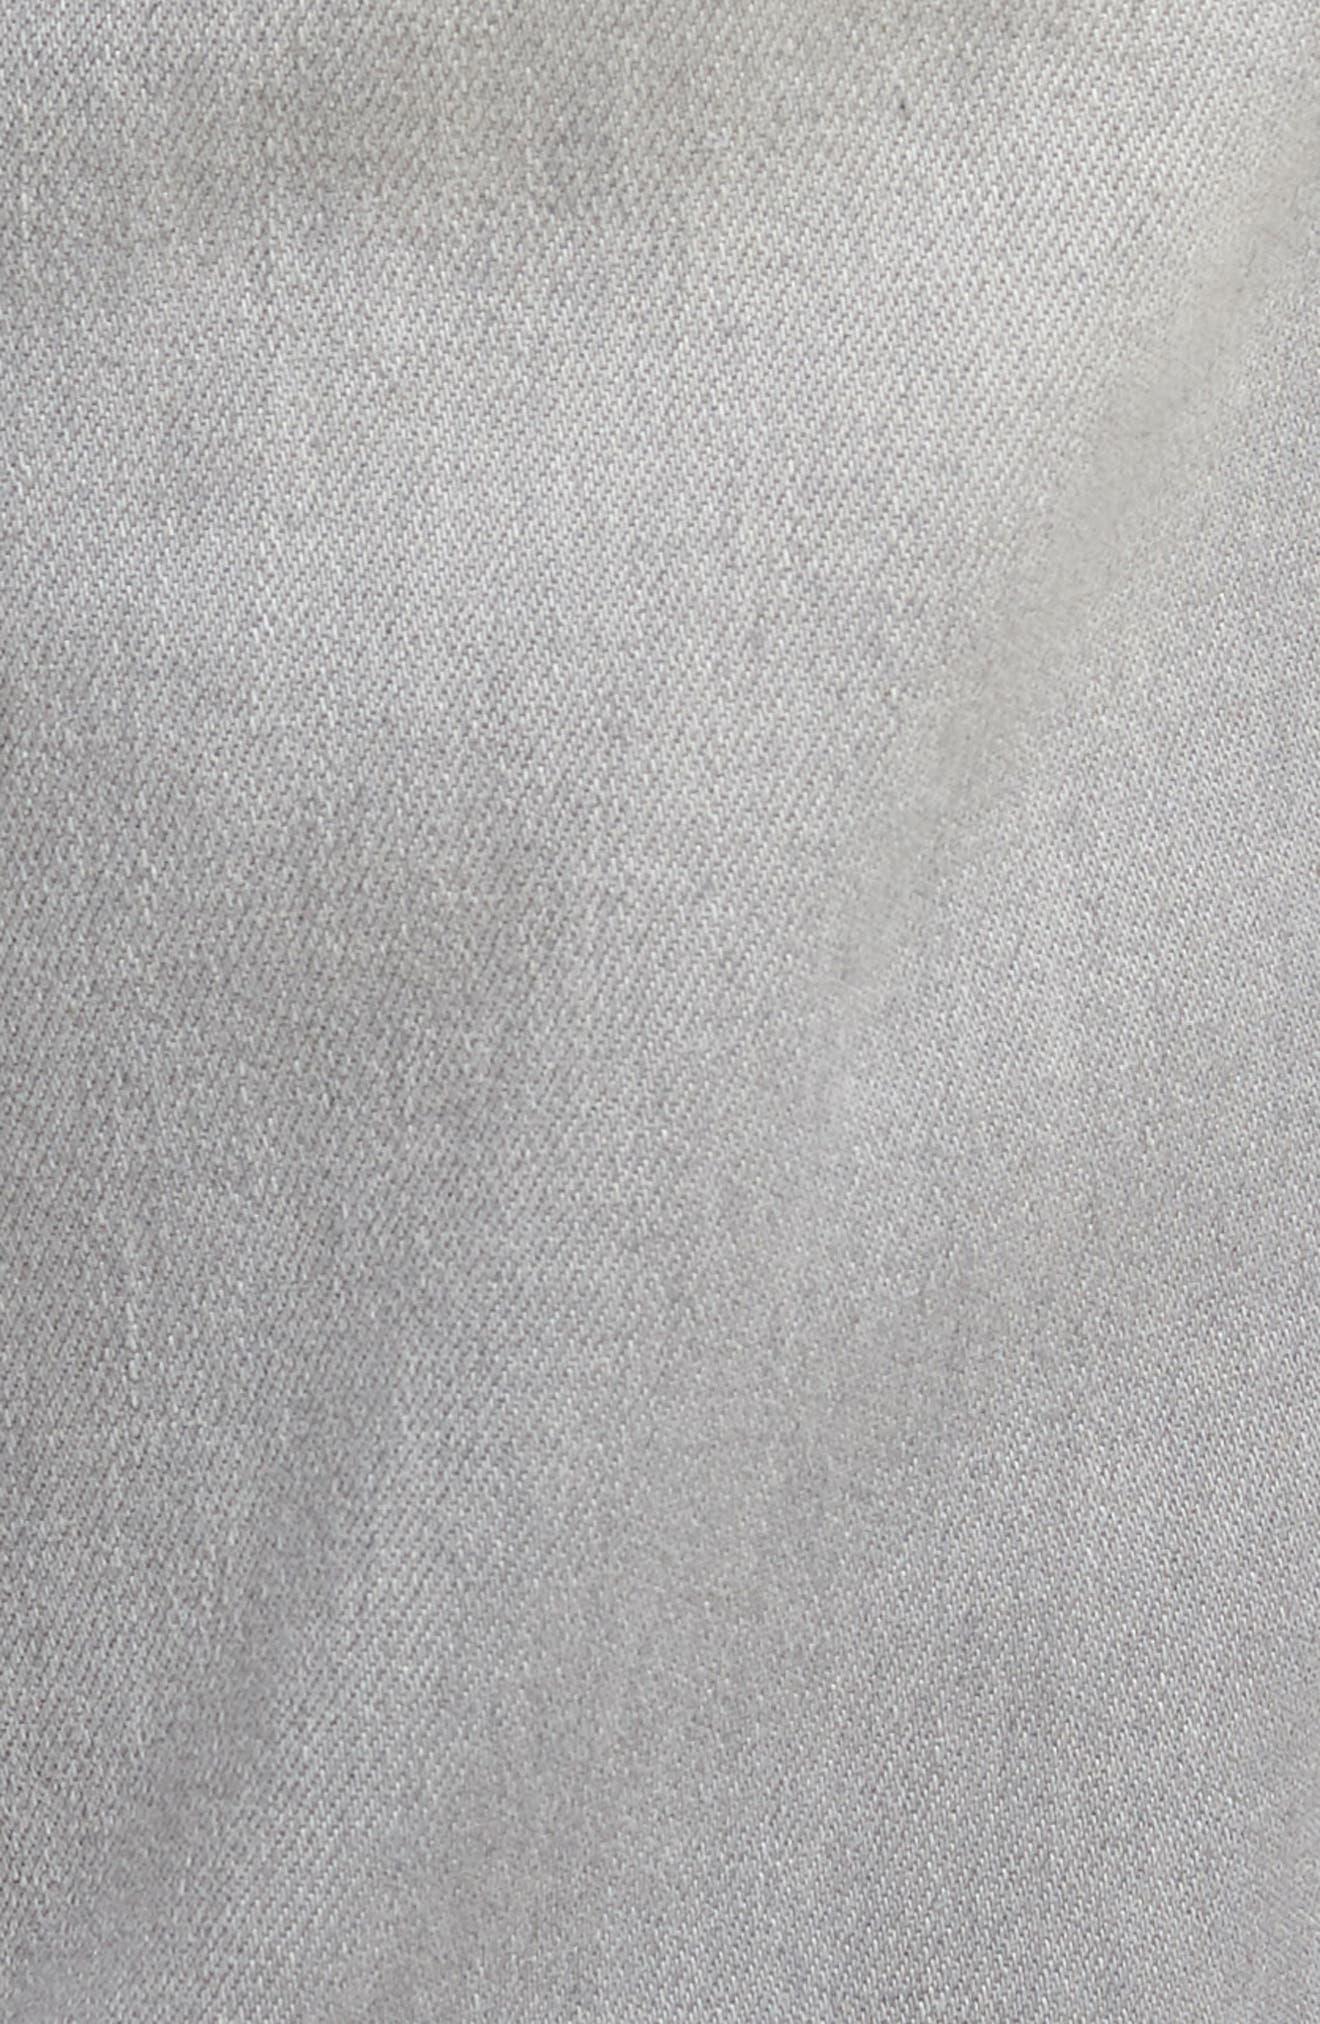 Jeans Co. Kingston Slim Straight Leg Jeans,                             Alternate thumbnail 5, color,                             Coal Mine Dark